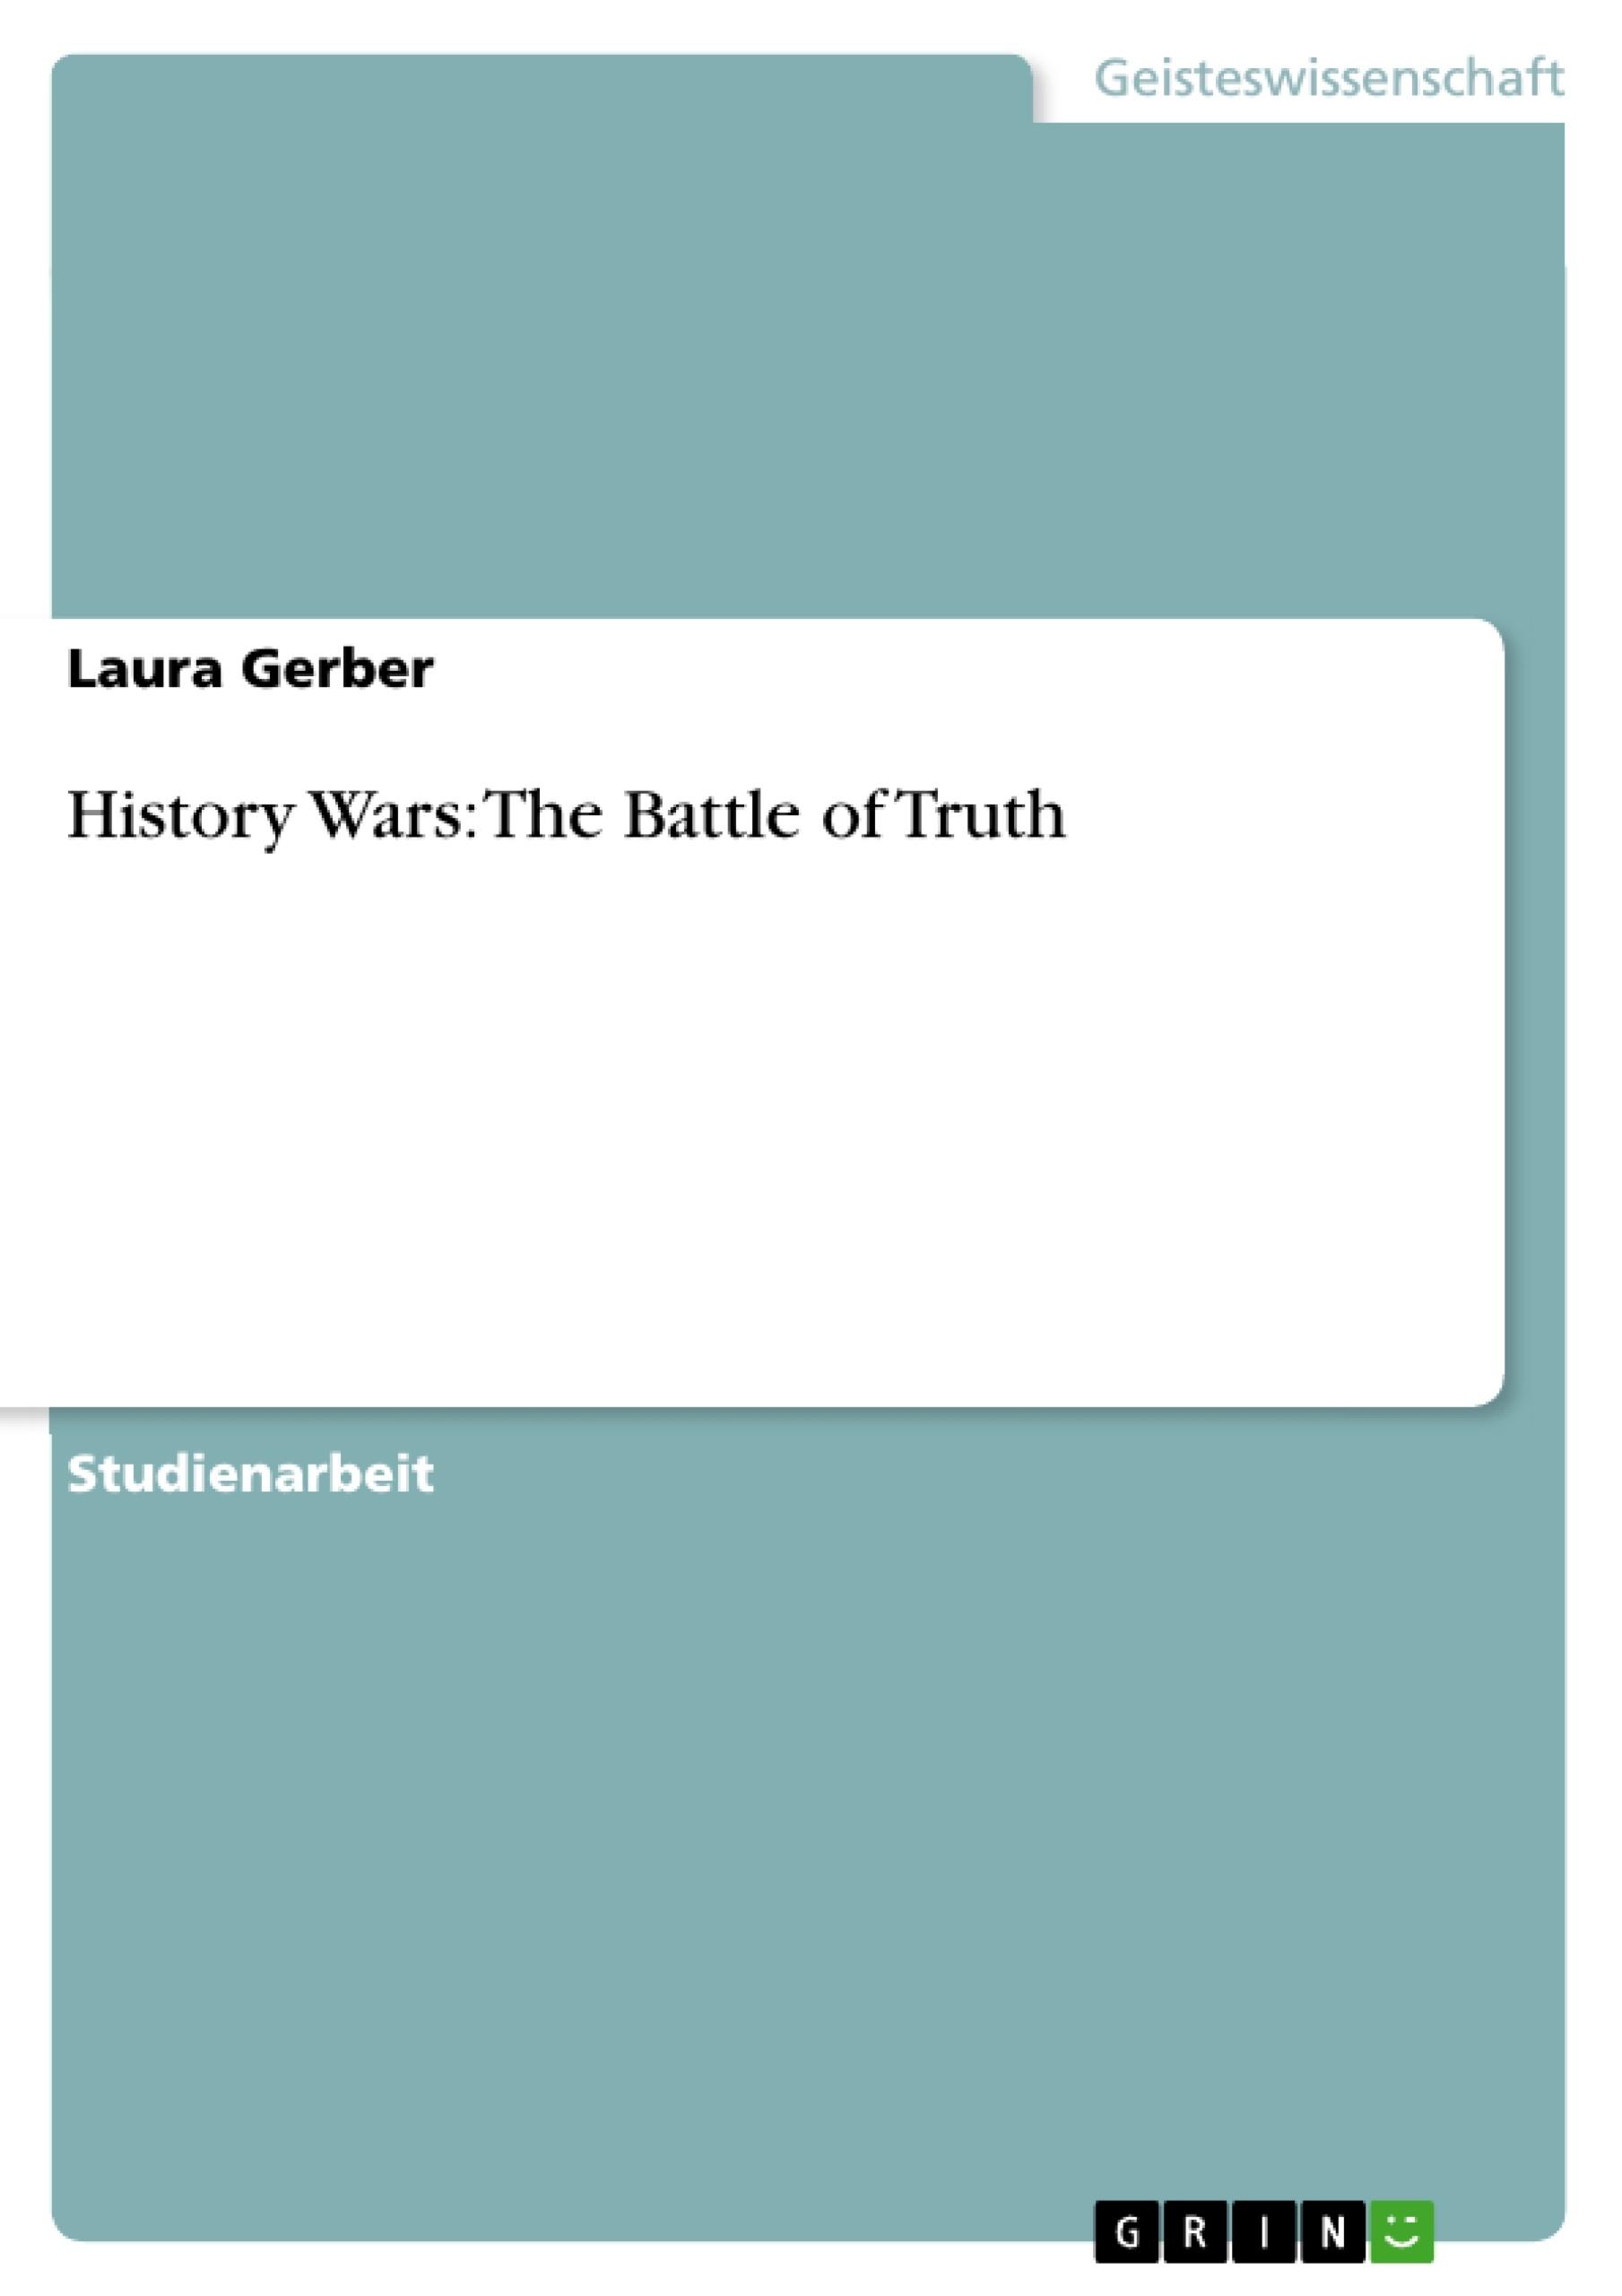 Titel: History Wars: The Battle of Truth